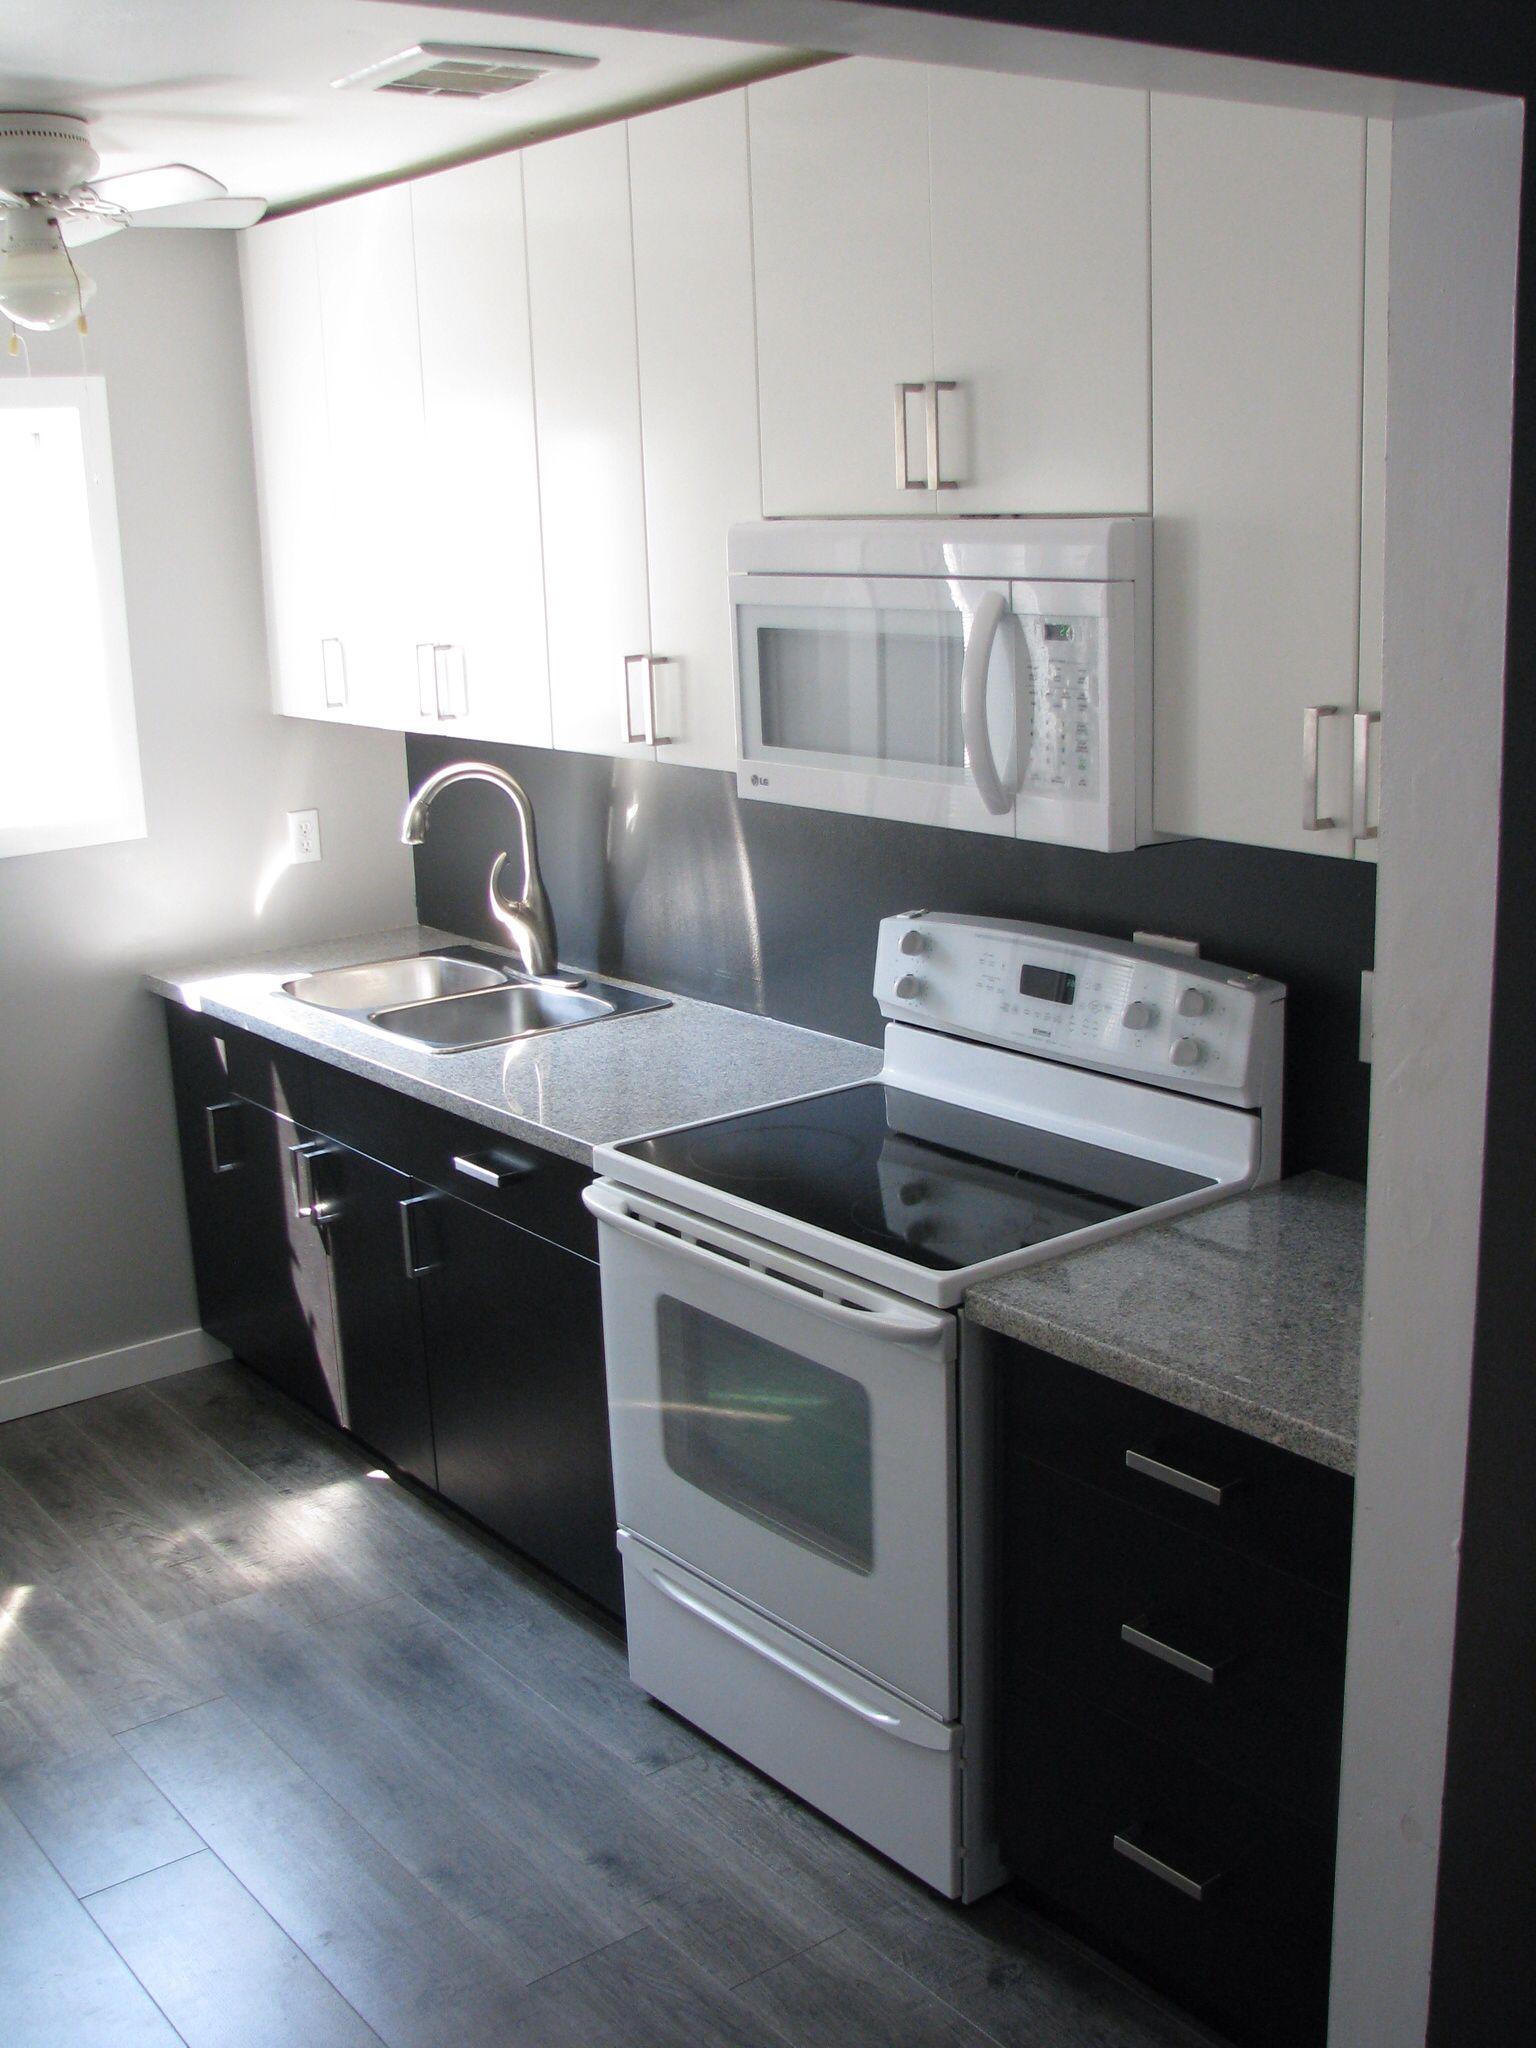 Kitchen Reno, Ikea Applad and Gnosjo with Salt